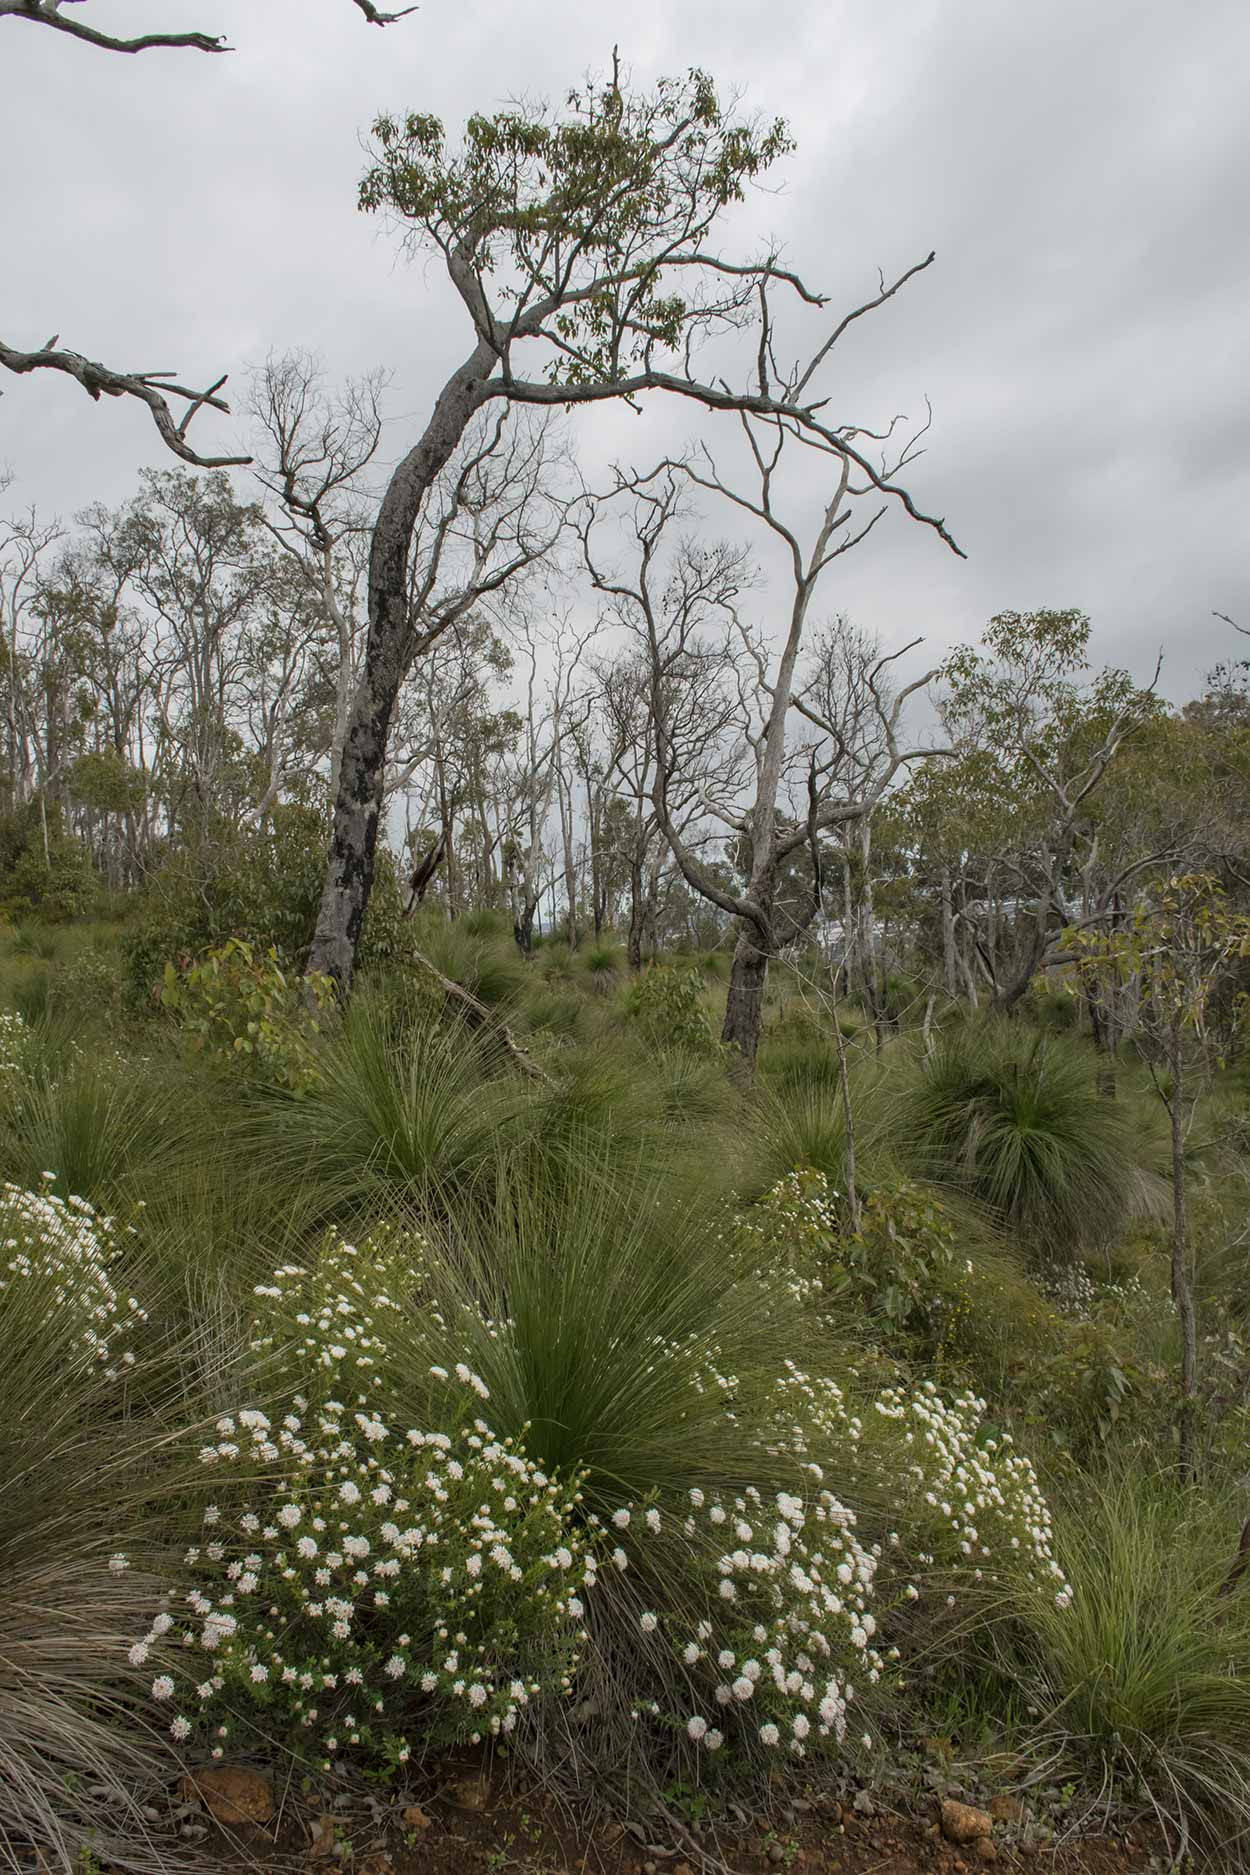 Flowers blooming on the West Terrace Walk, Mundy Regional Park, Perth, Western Australia